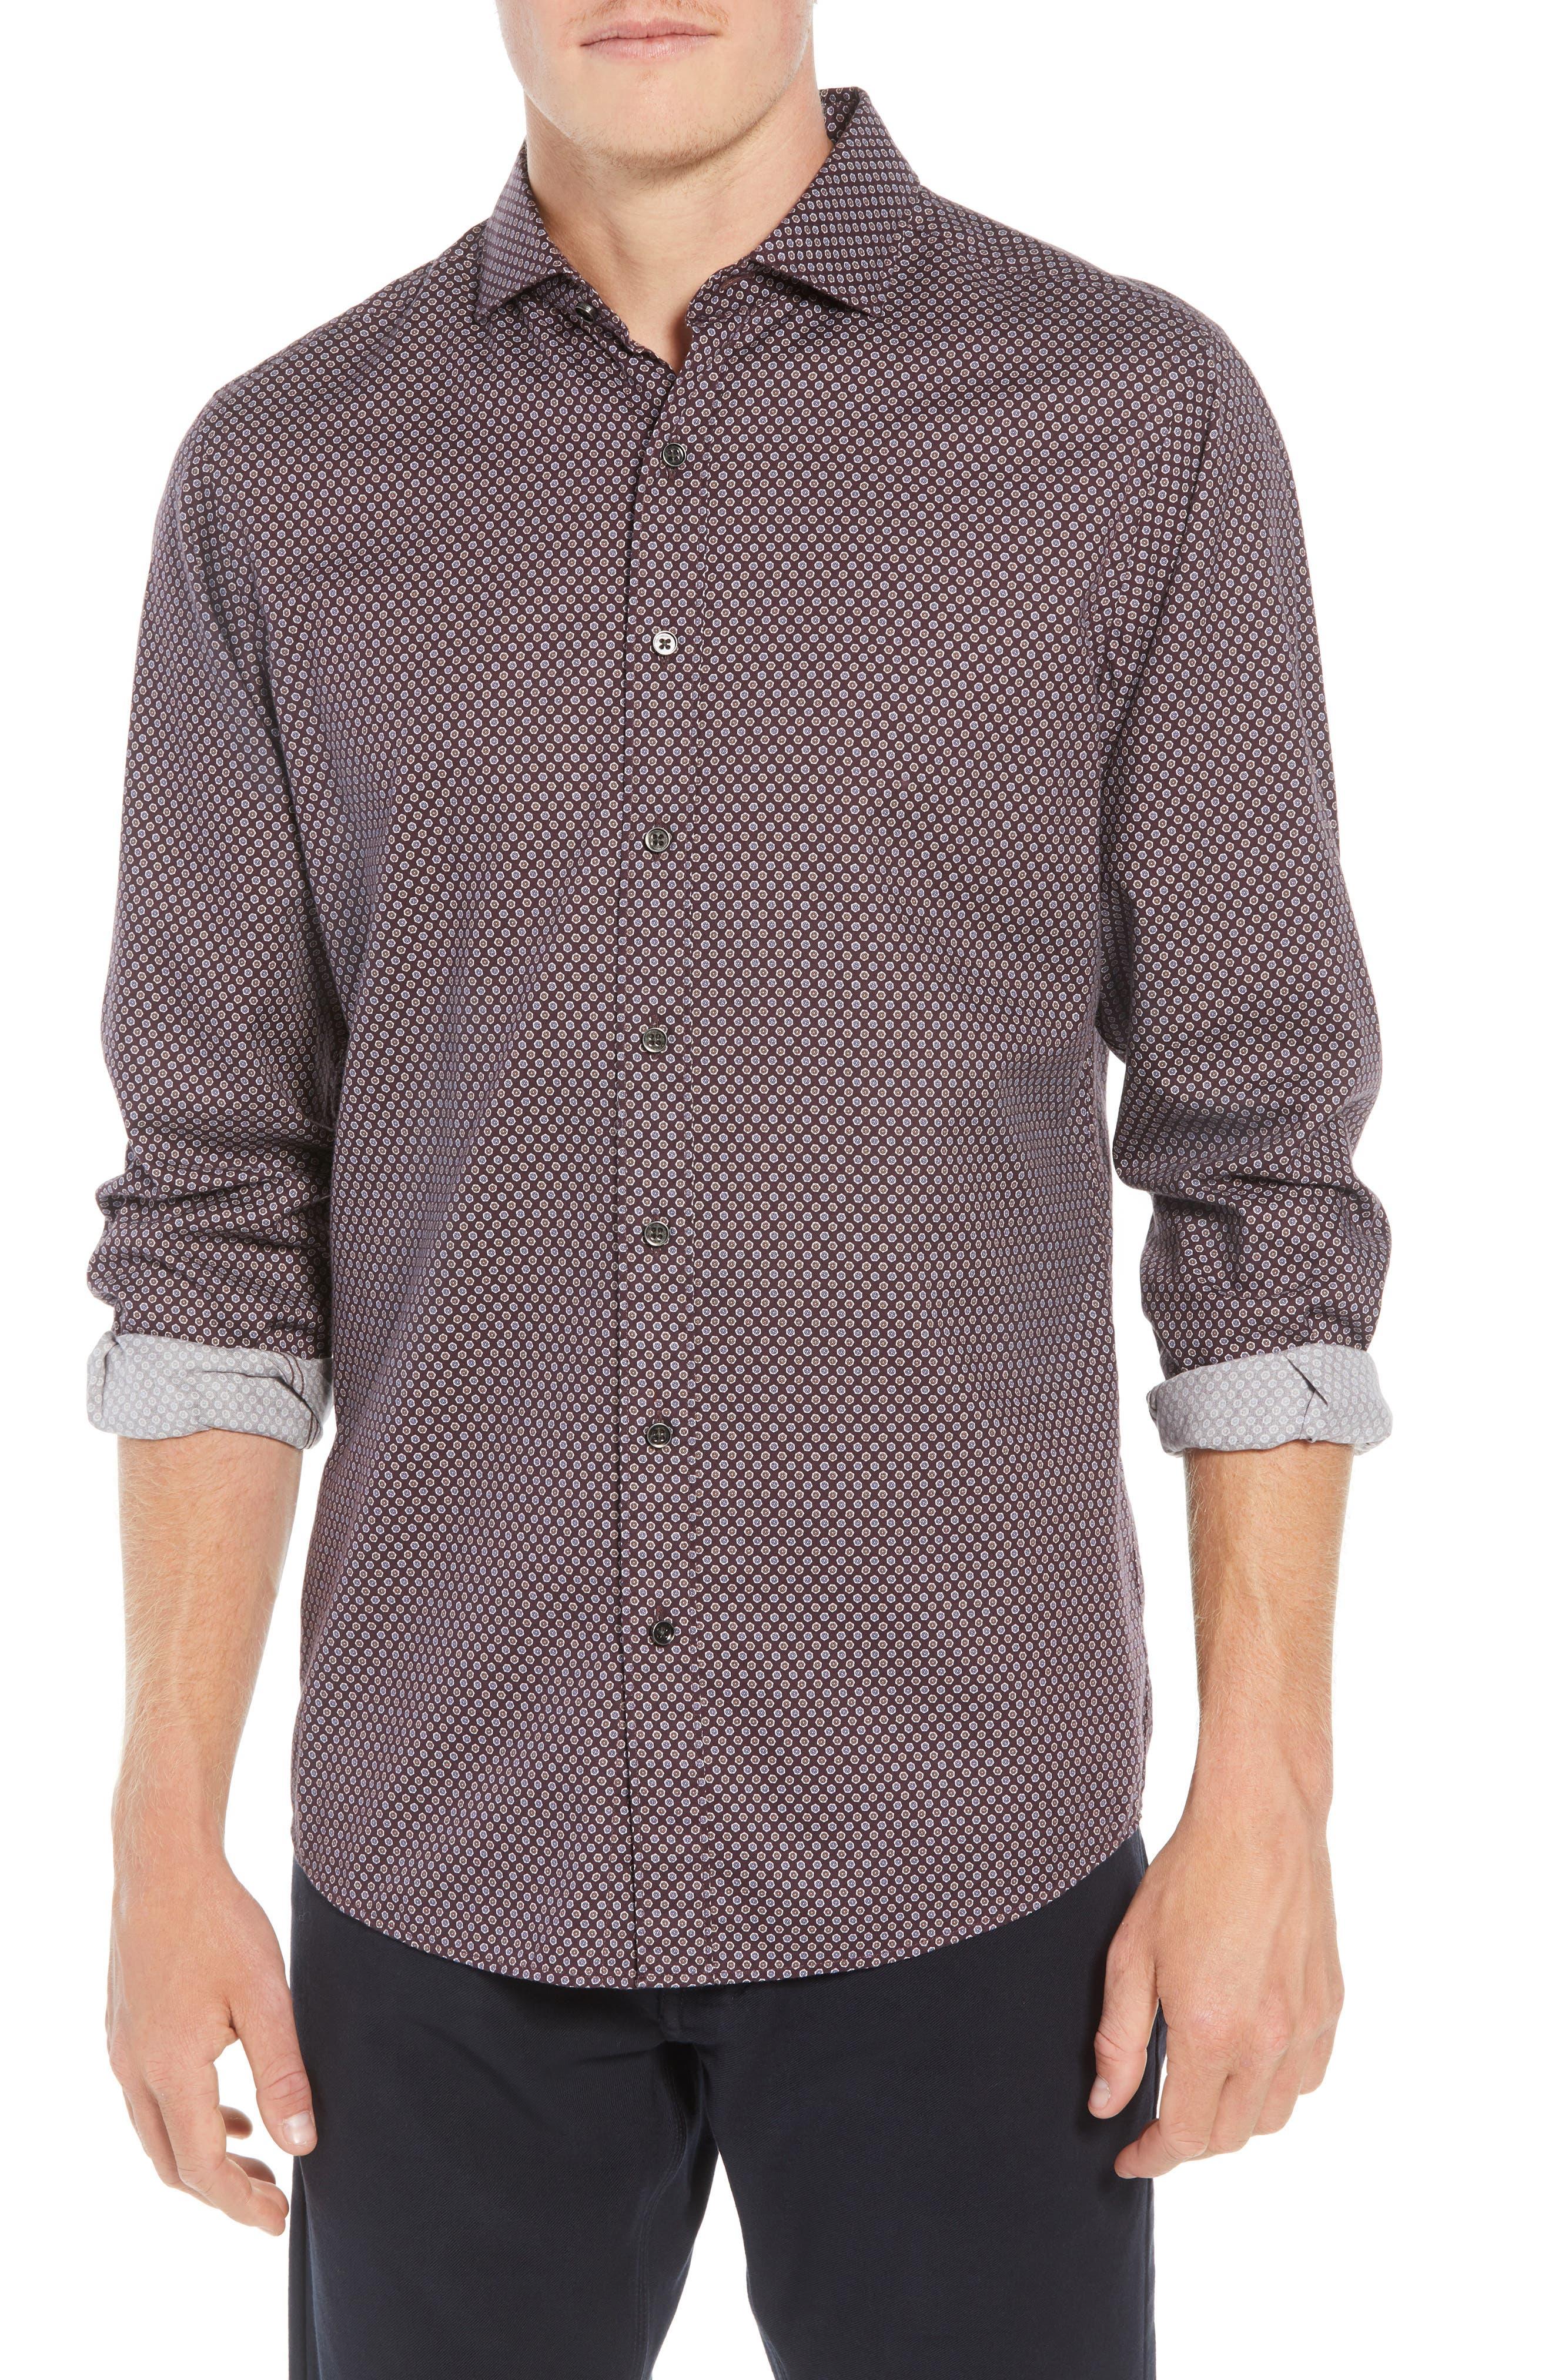 Marsden Bay Regular Fit Sport Shirt,                         Main,                         color, BORDEAUX